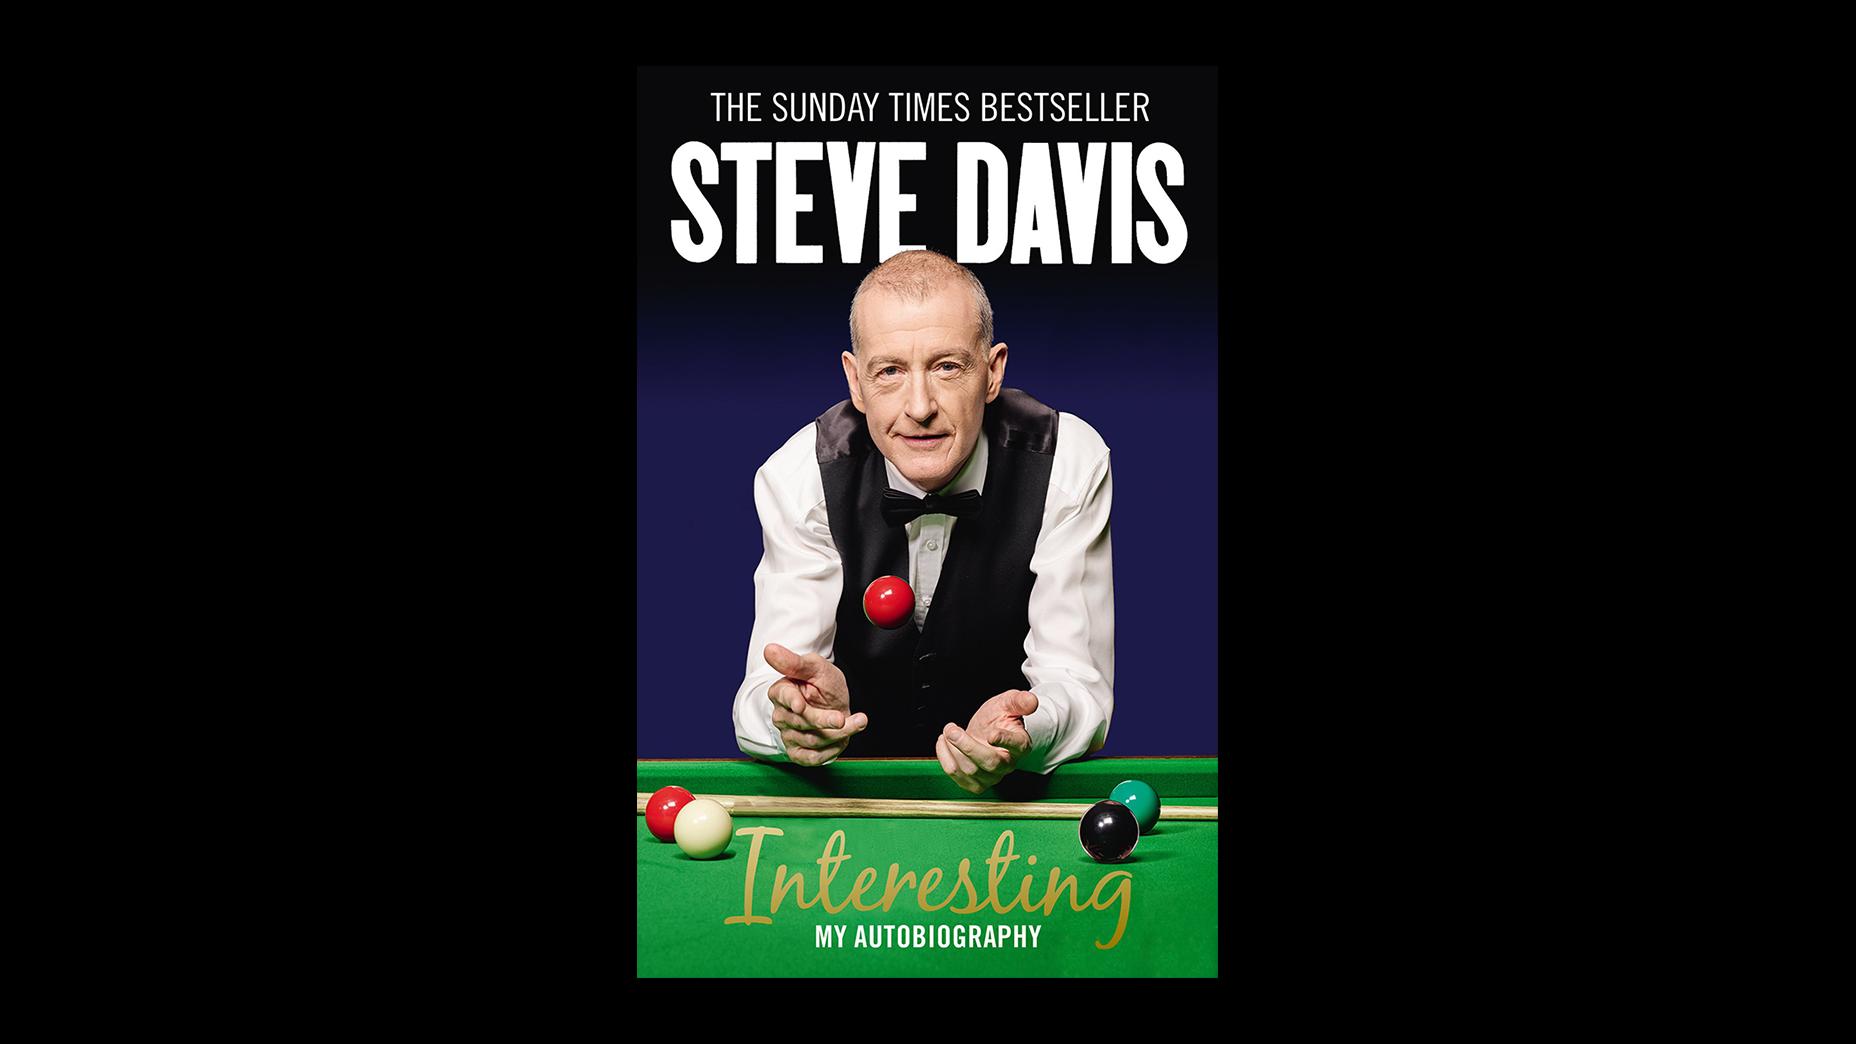 Interesting: My Autobiography by Steve Davis